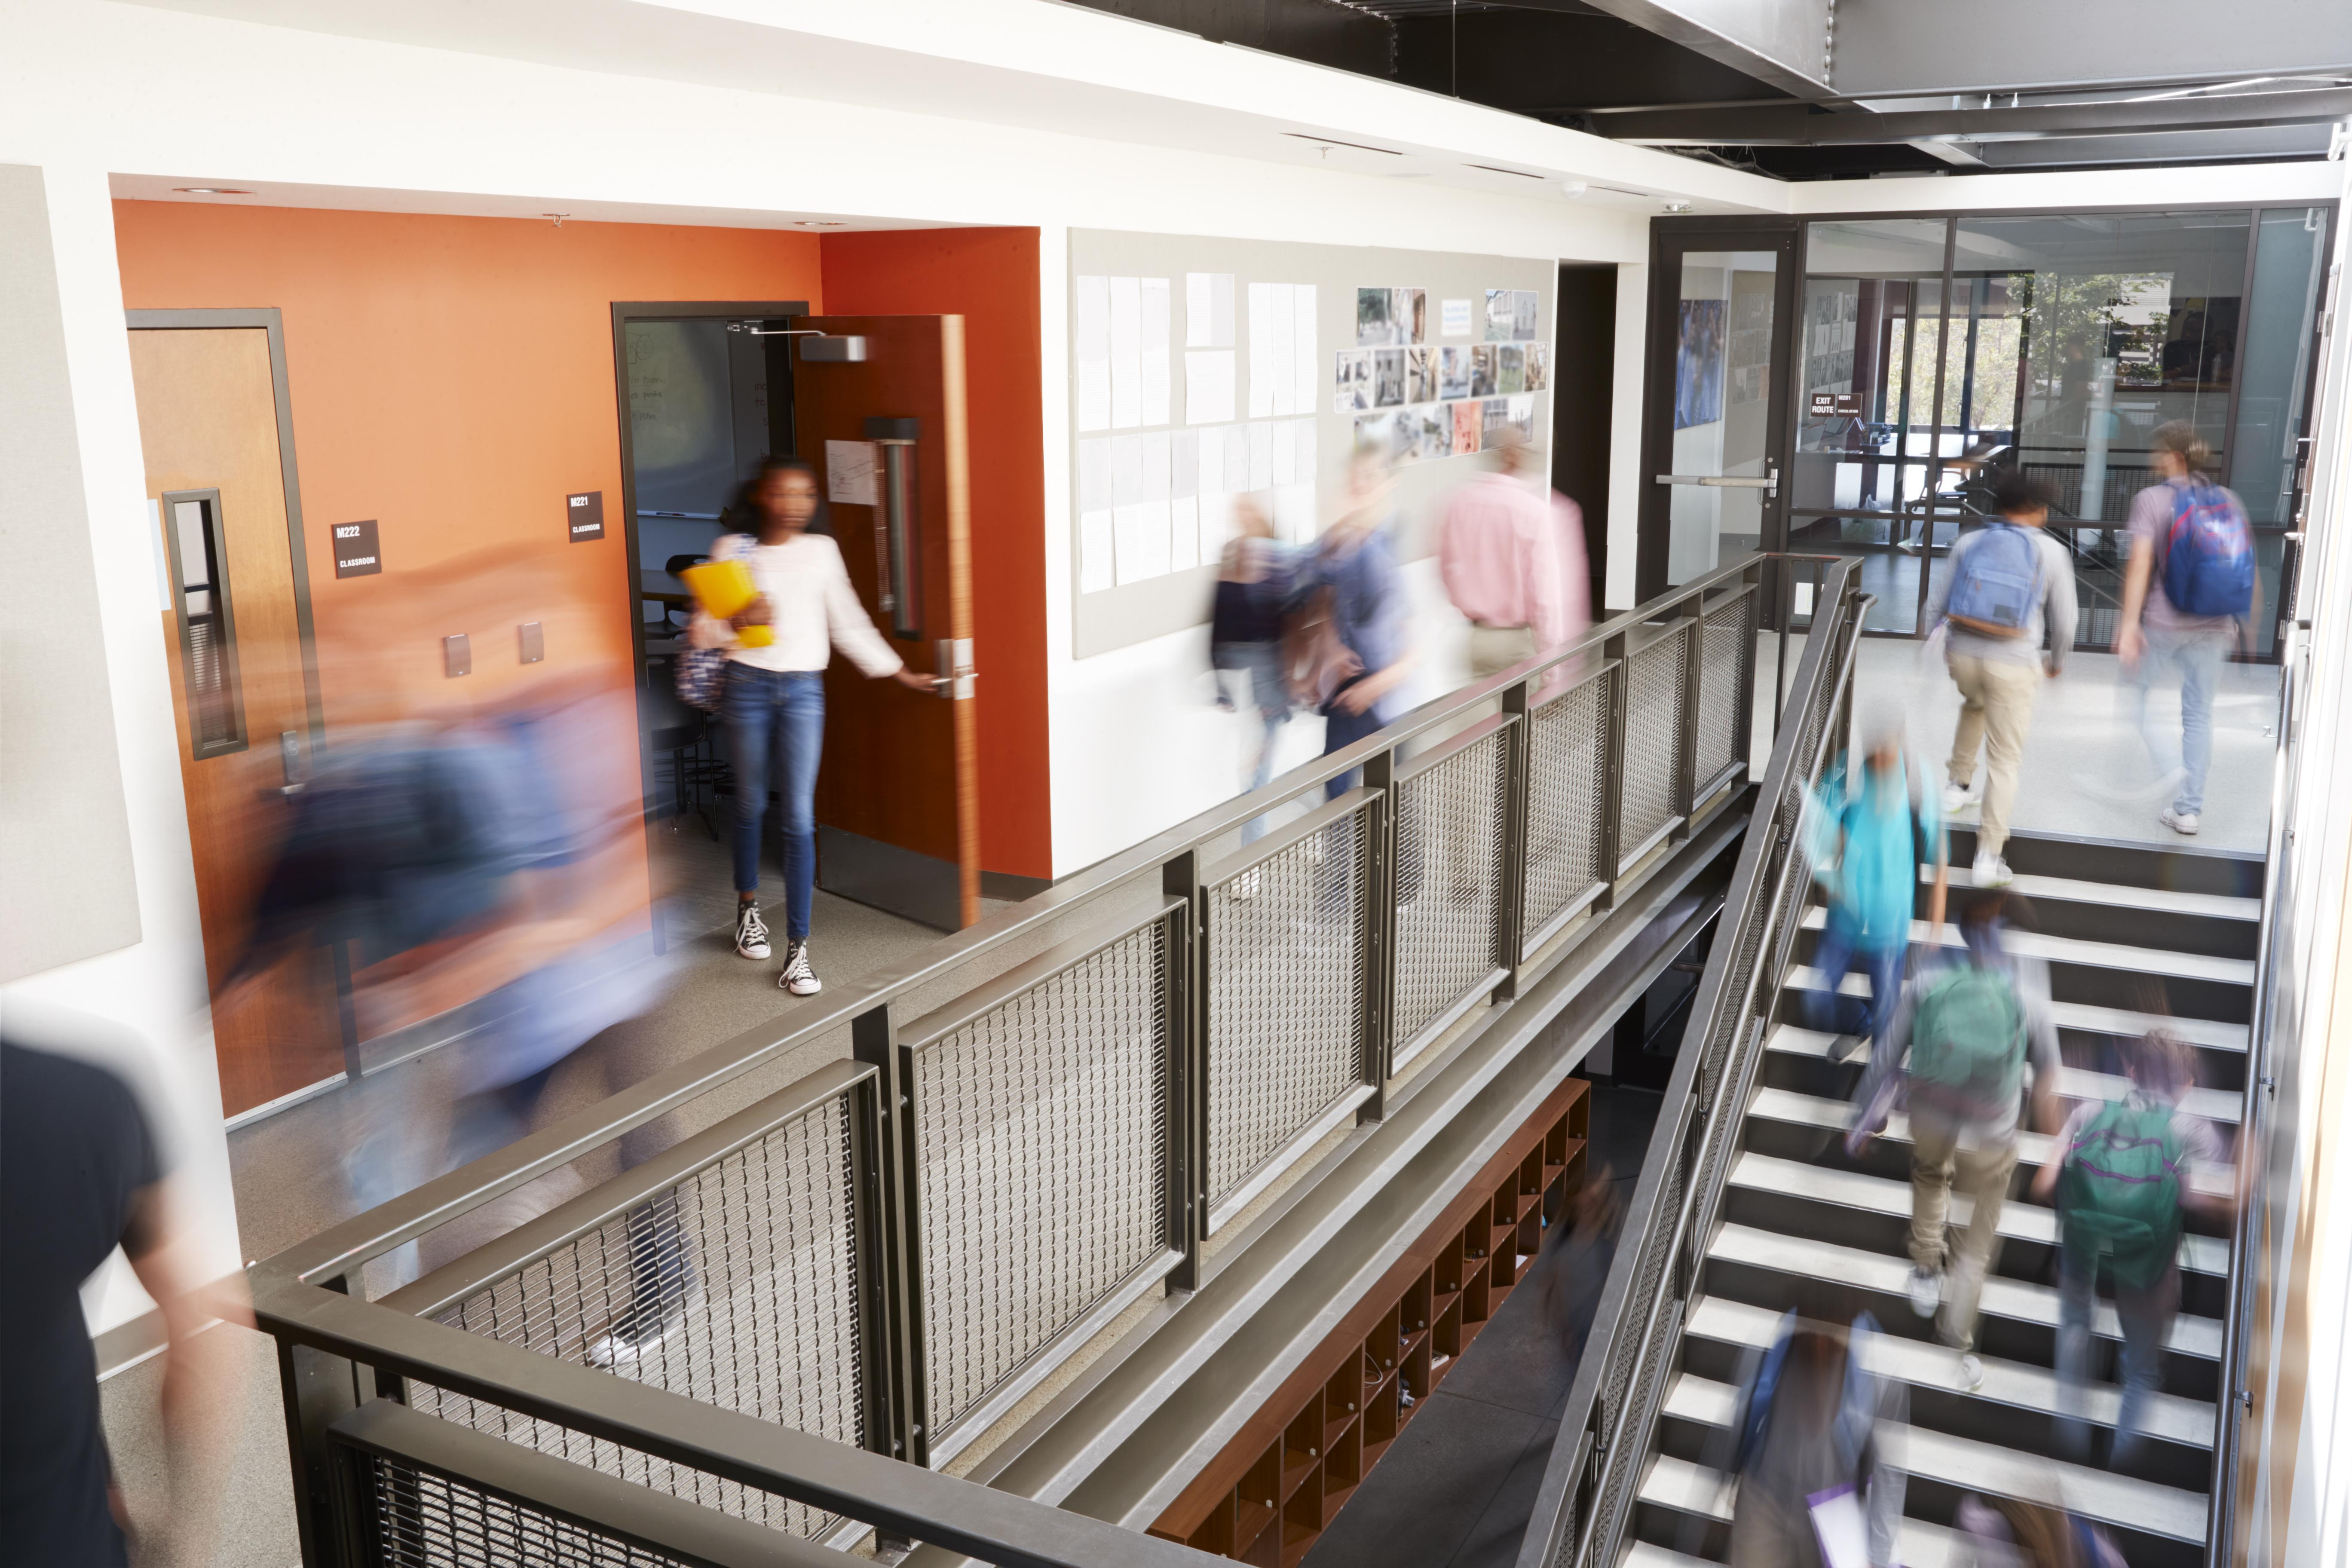 Greenville County Schools re-evaluating IB programs at 3